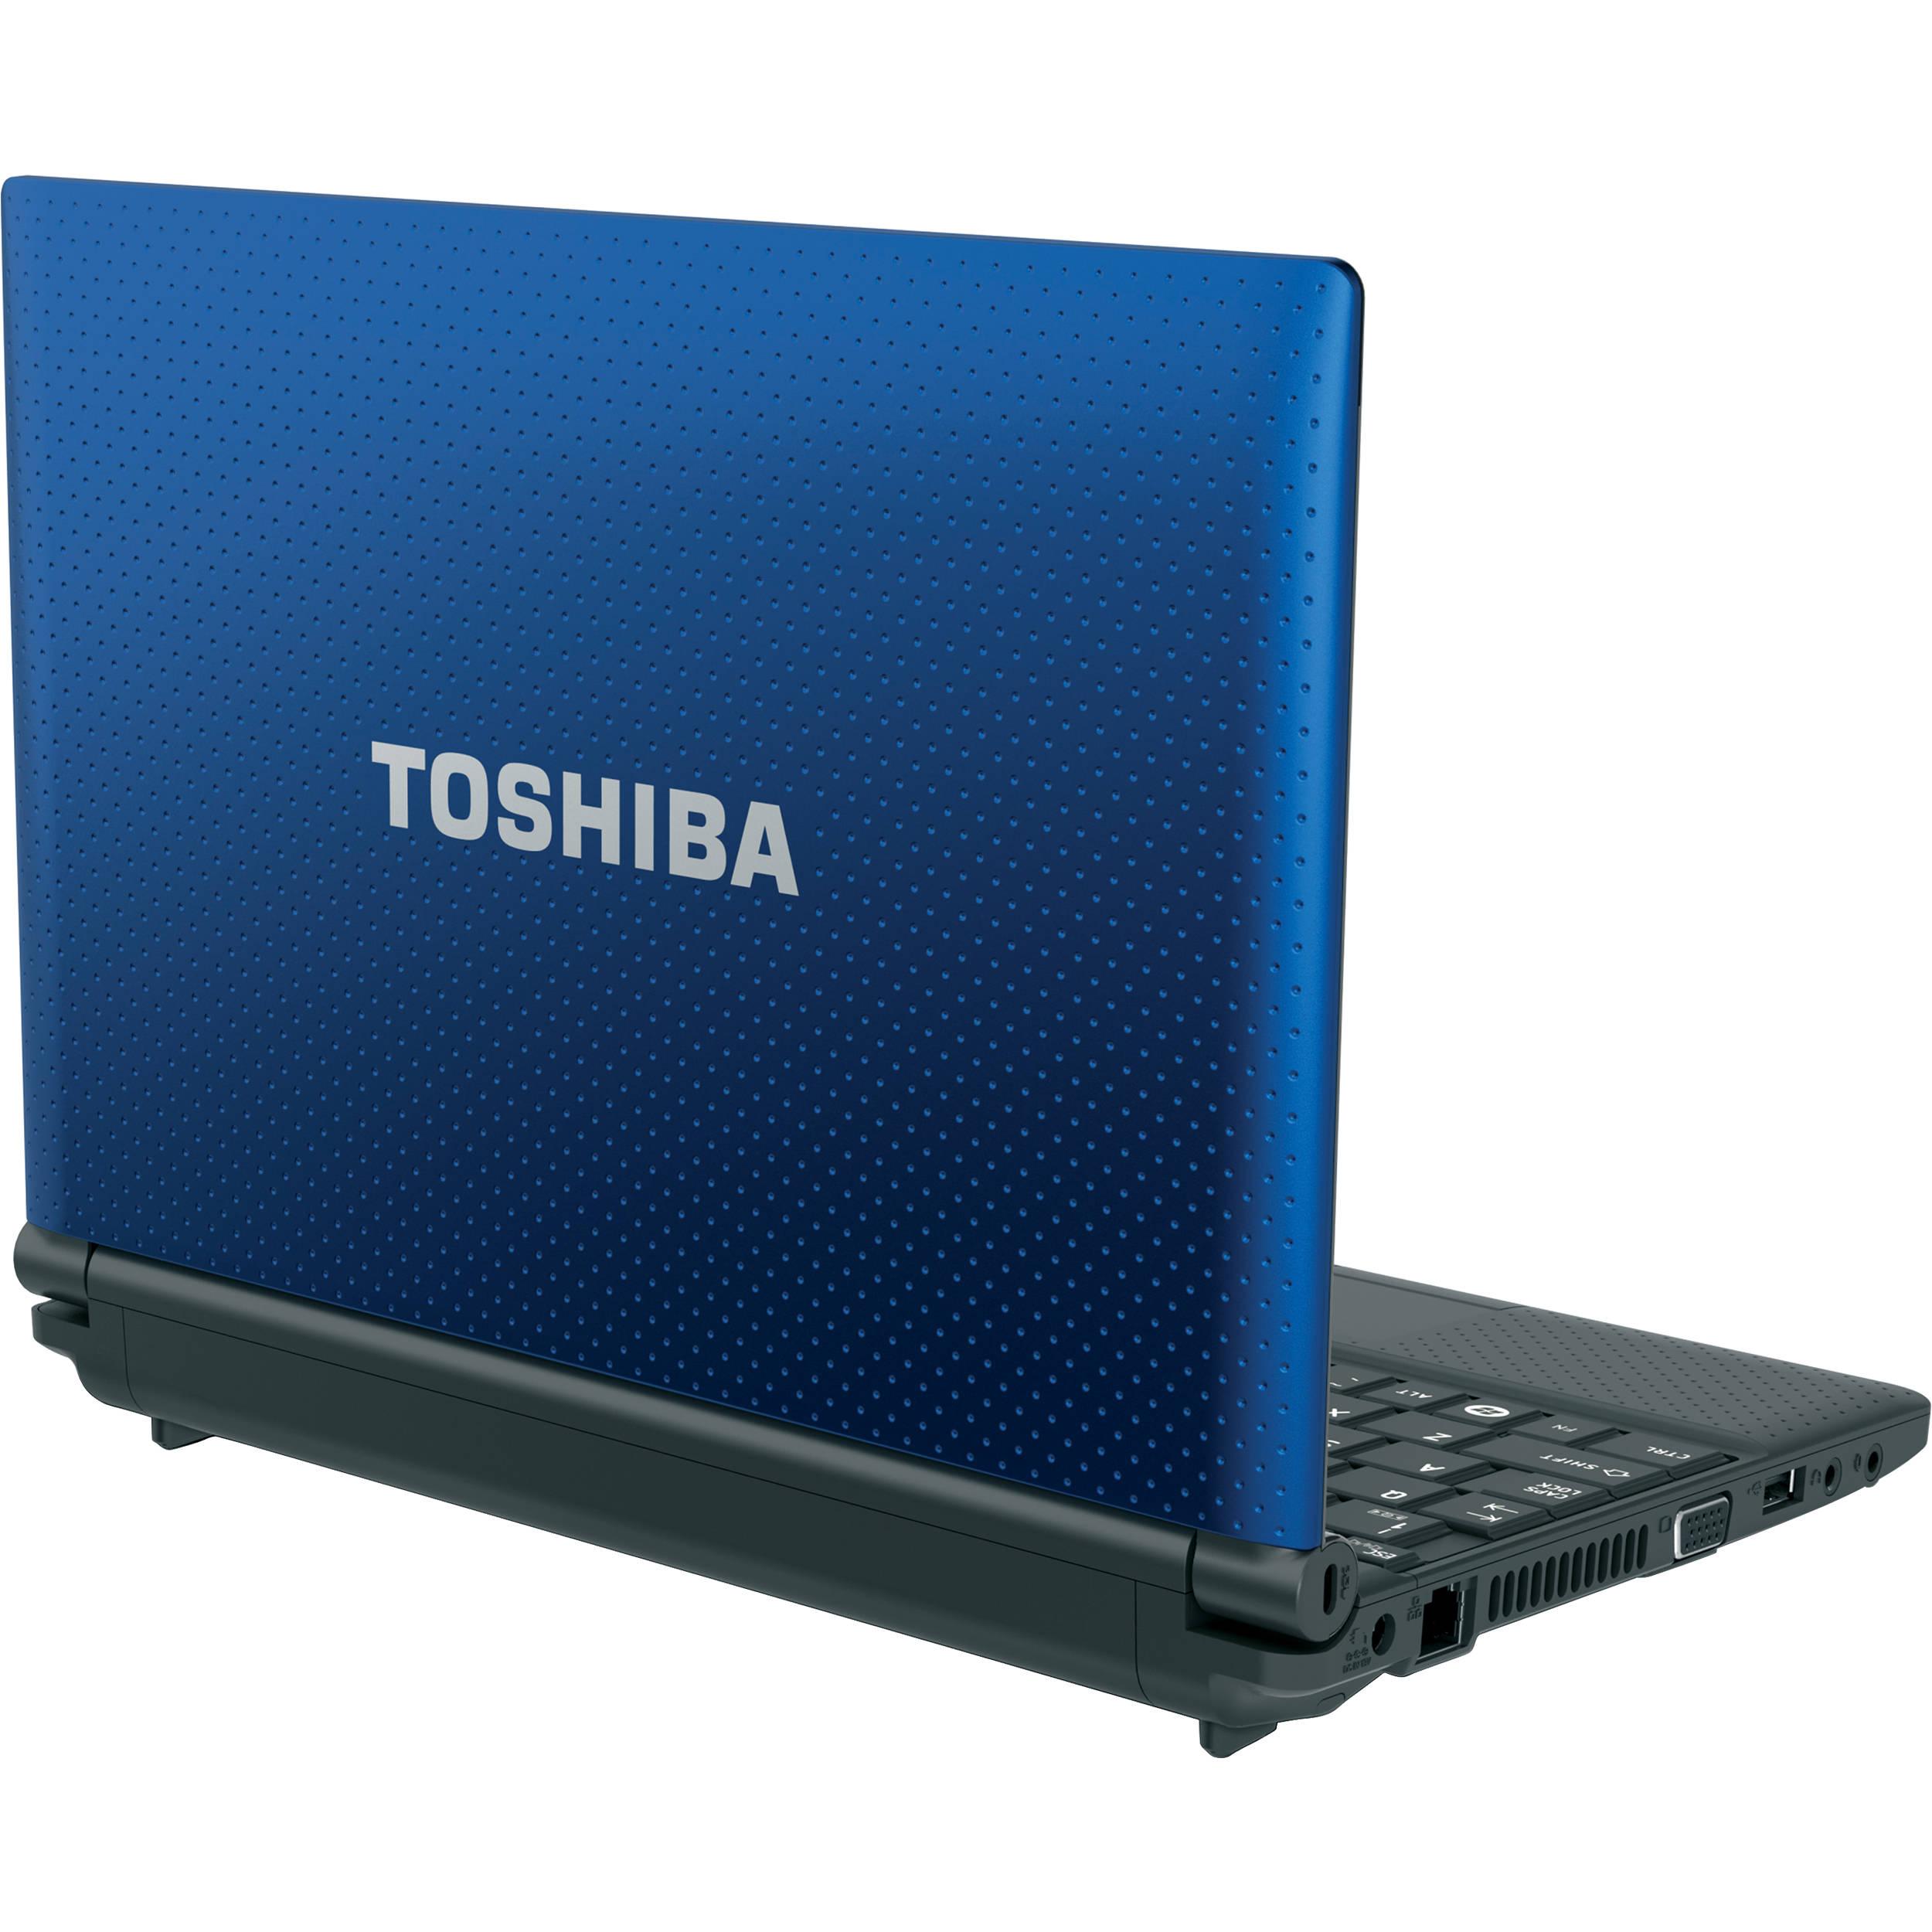 Toshiba mini NB505-N508BL 10.1